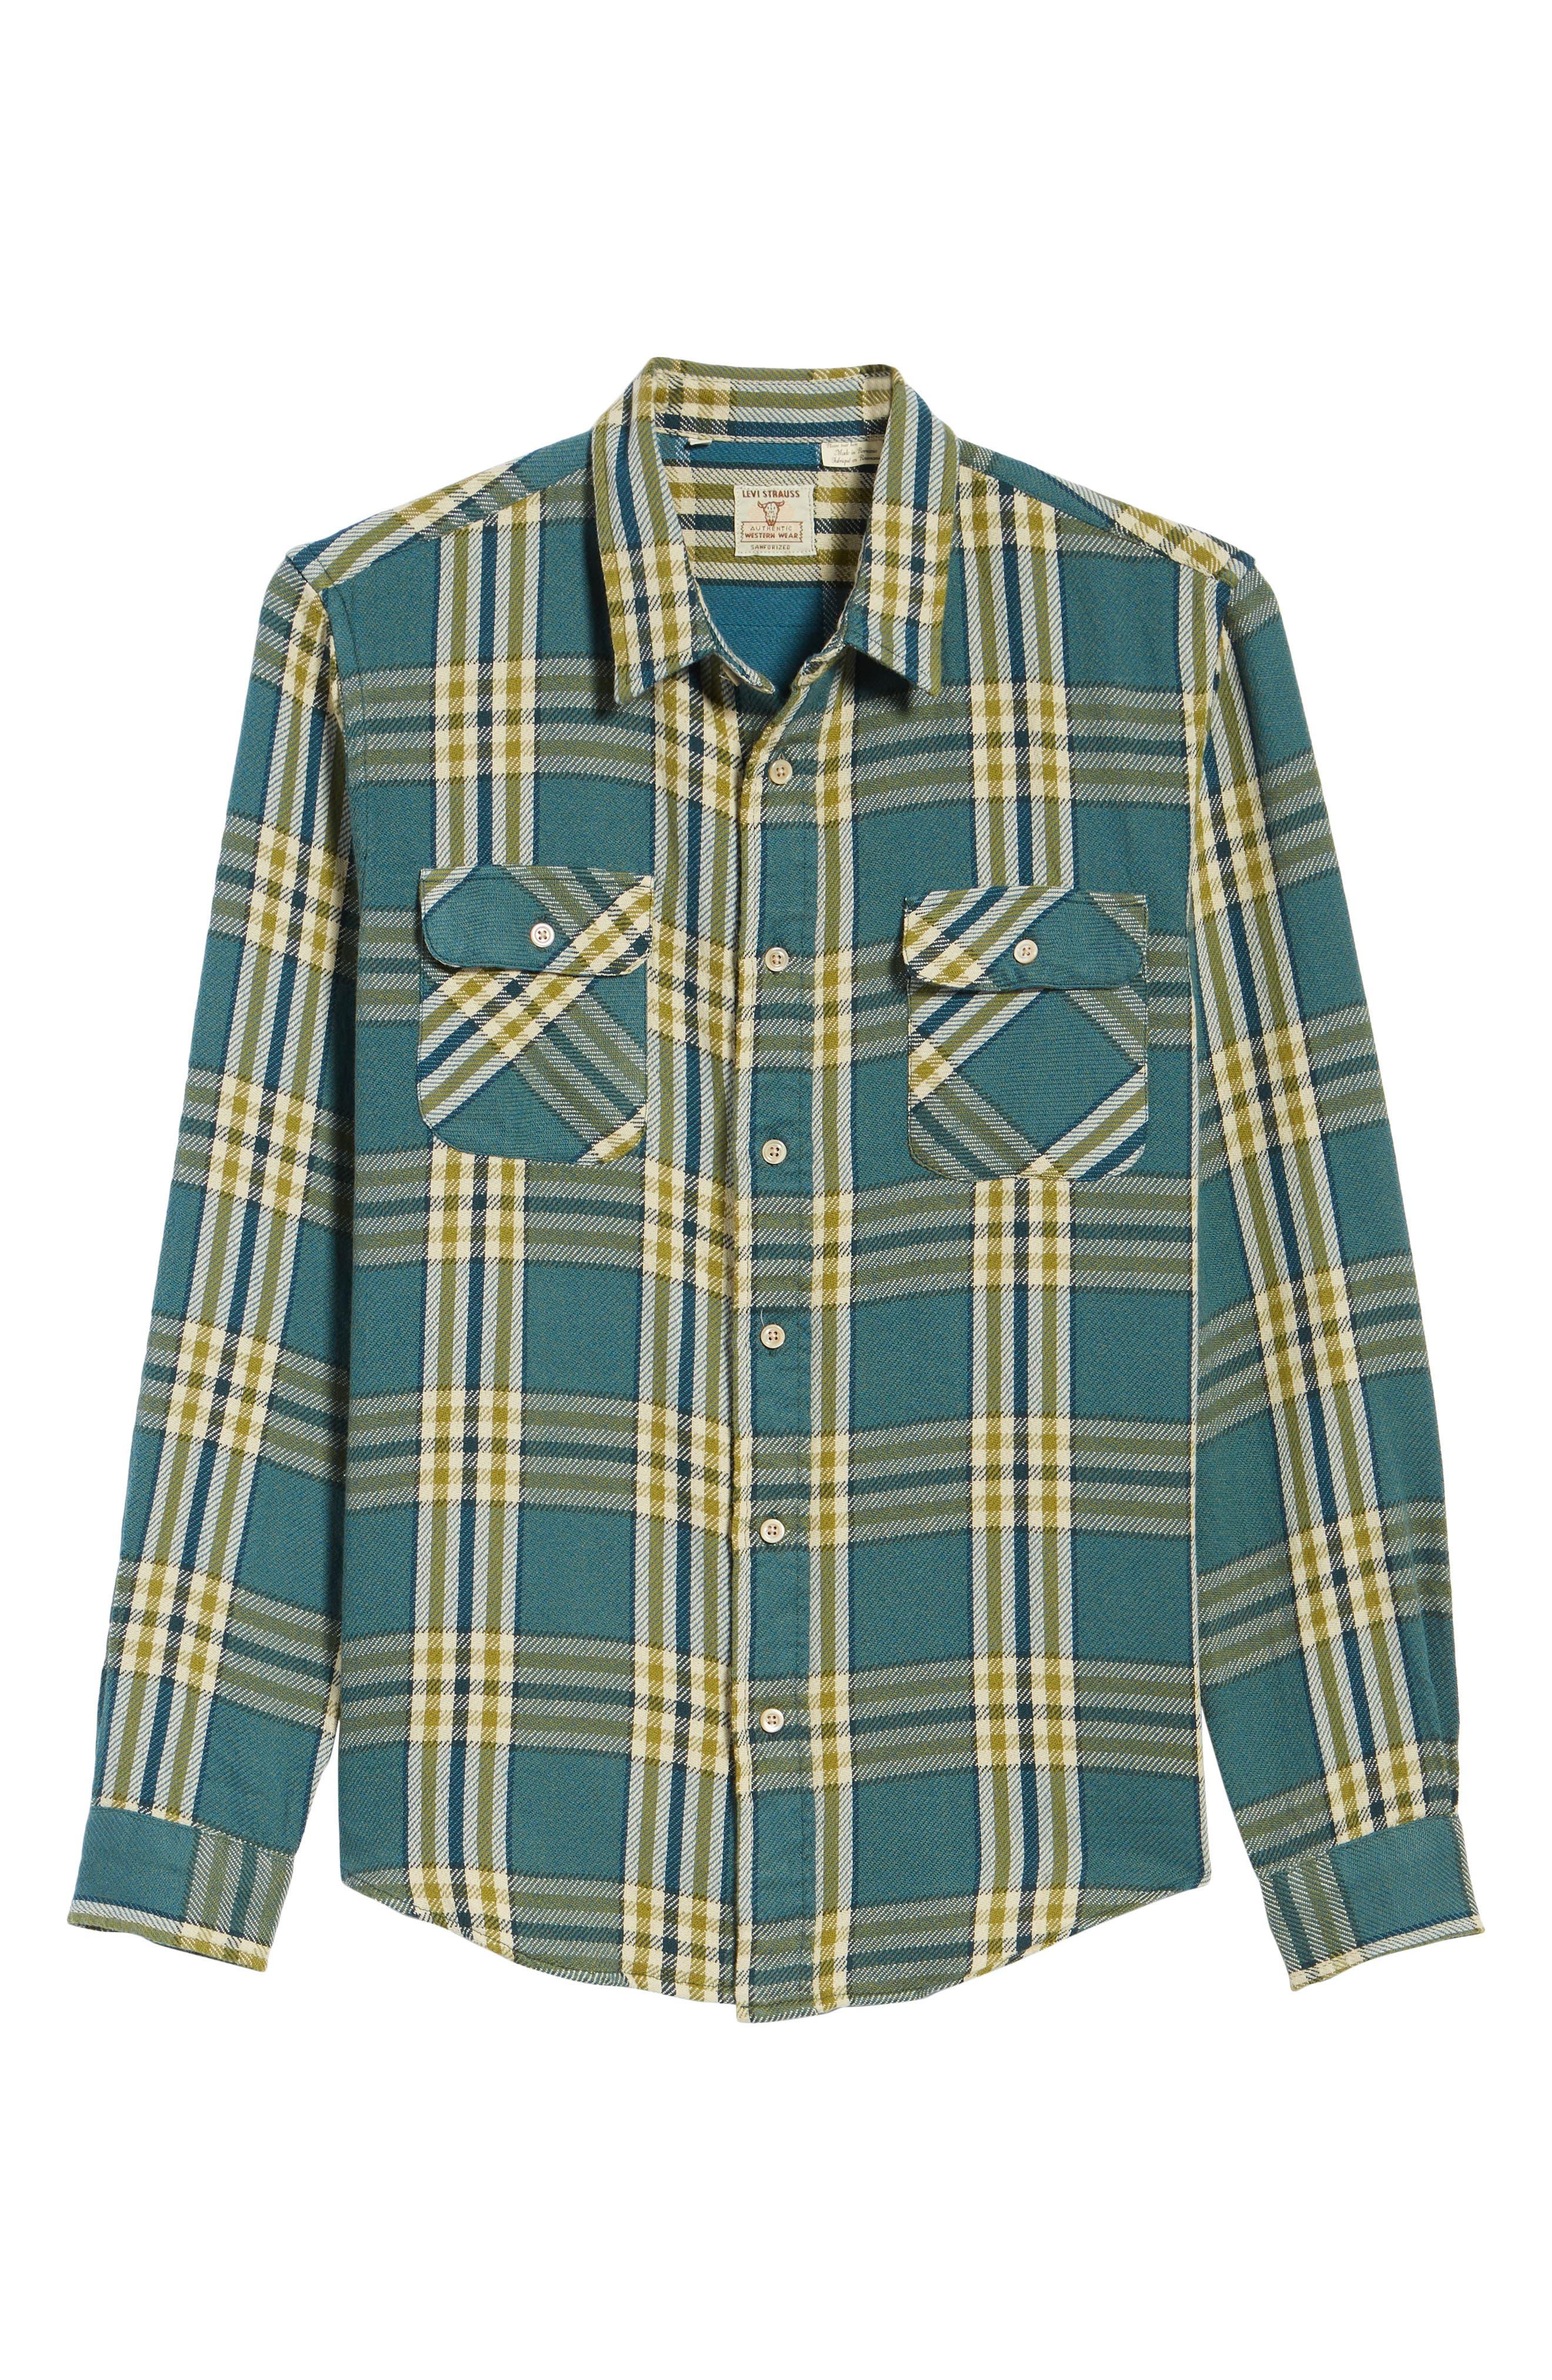 Shorthorn Western Shirt,                             Alternate thumbnail 6, color,                             Under Water Blue Multi